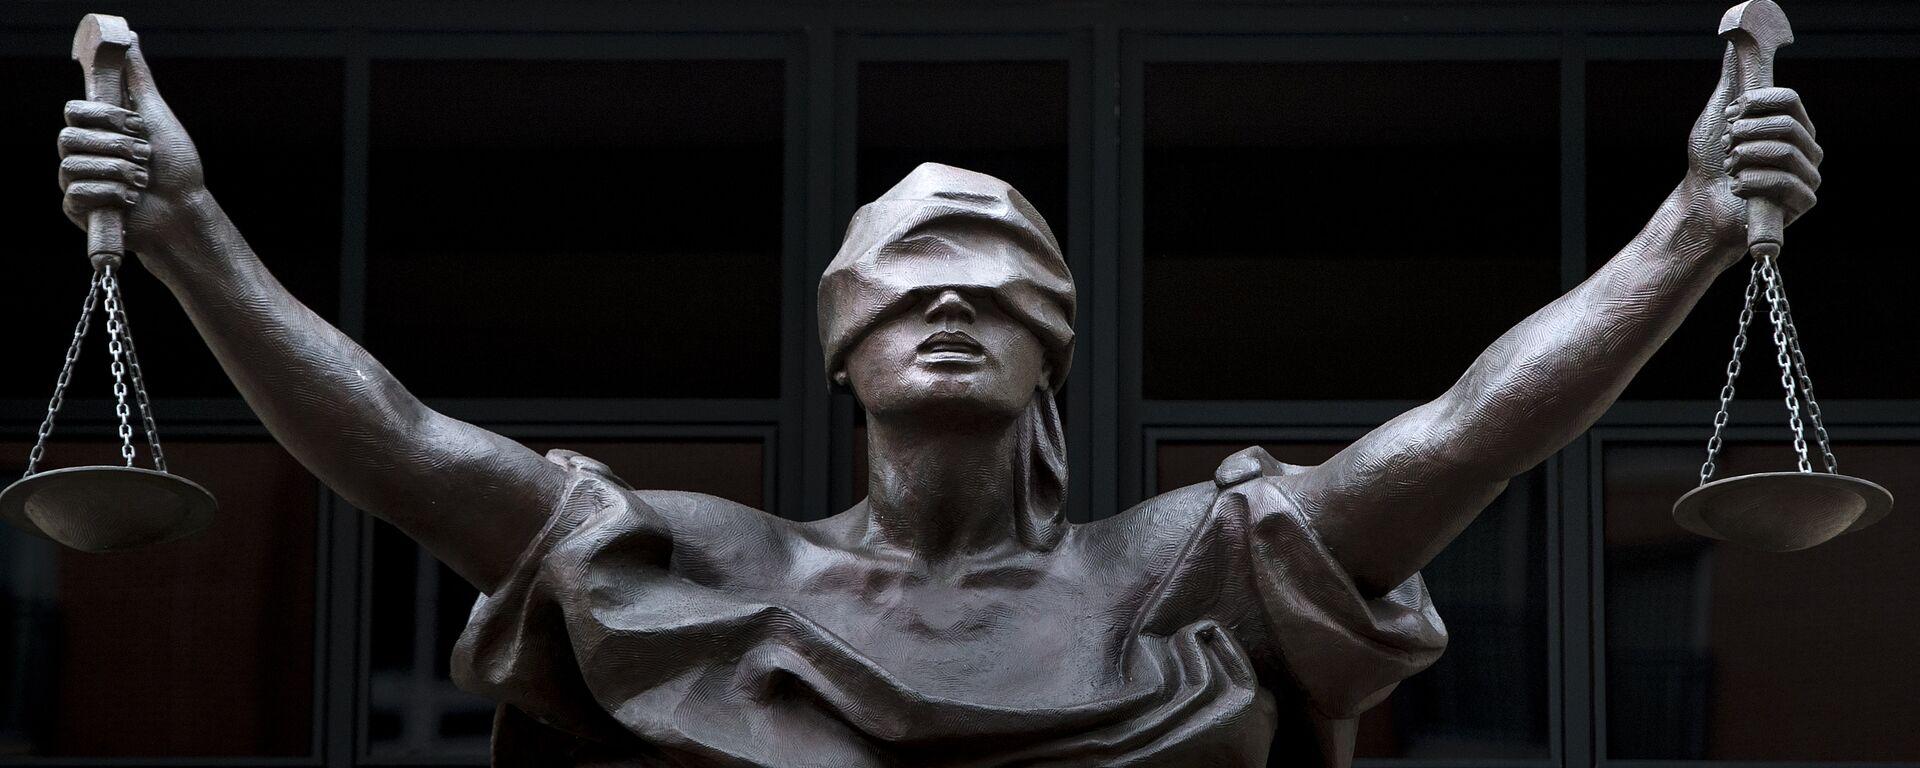 Estatua de la Justicia - Sputnik Mundo, 1920, 25.11.2020